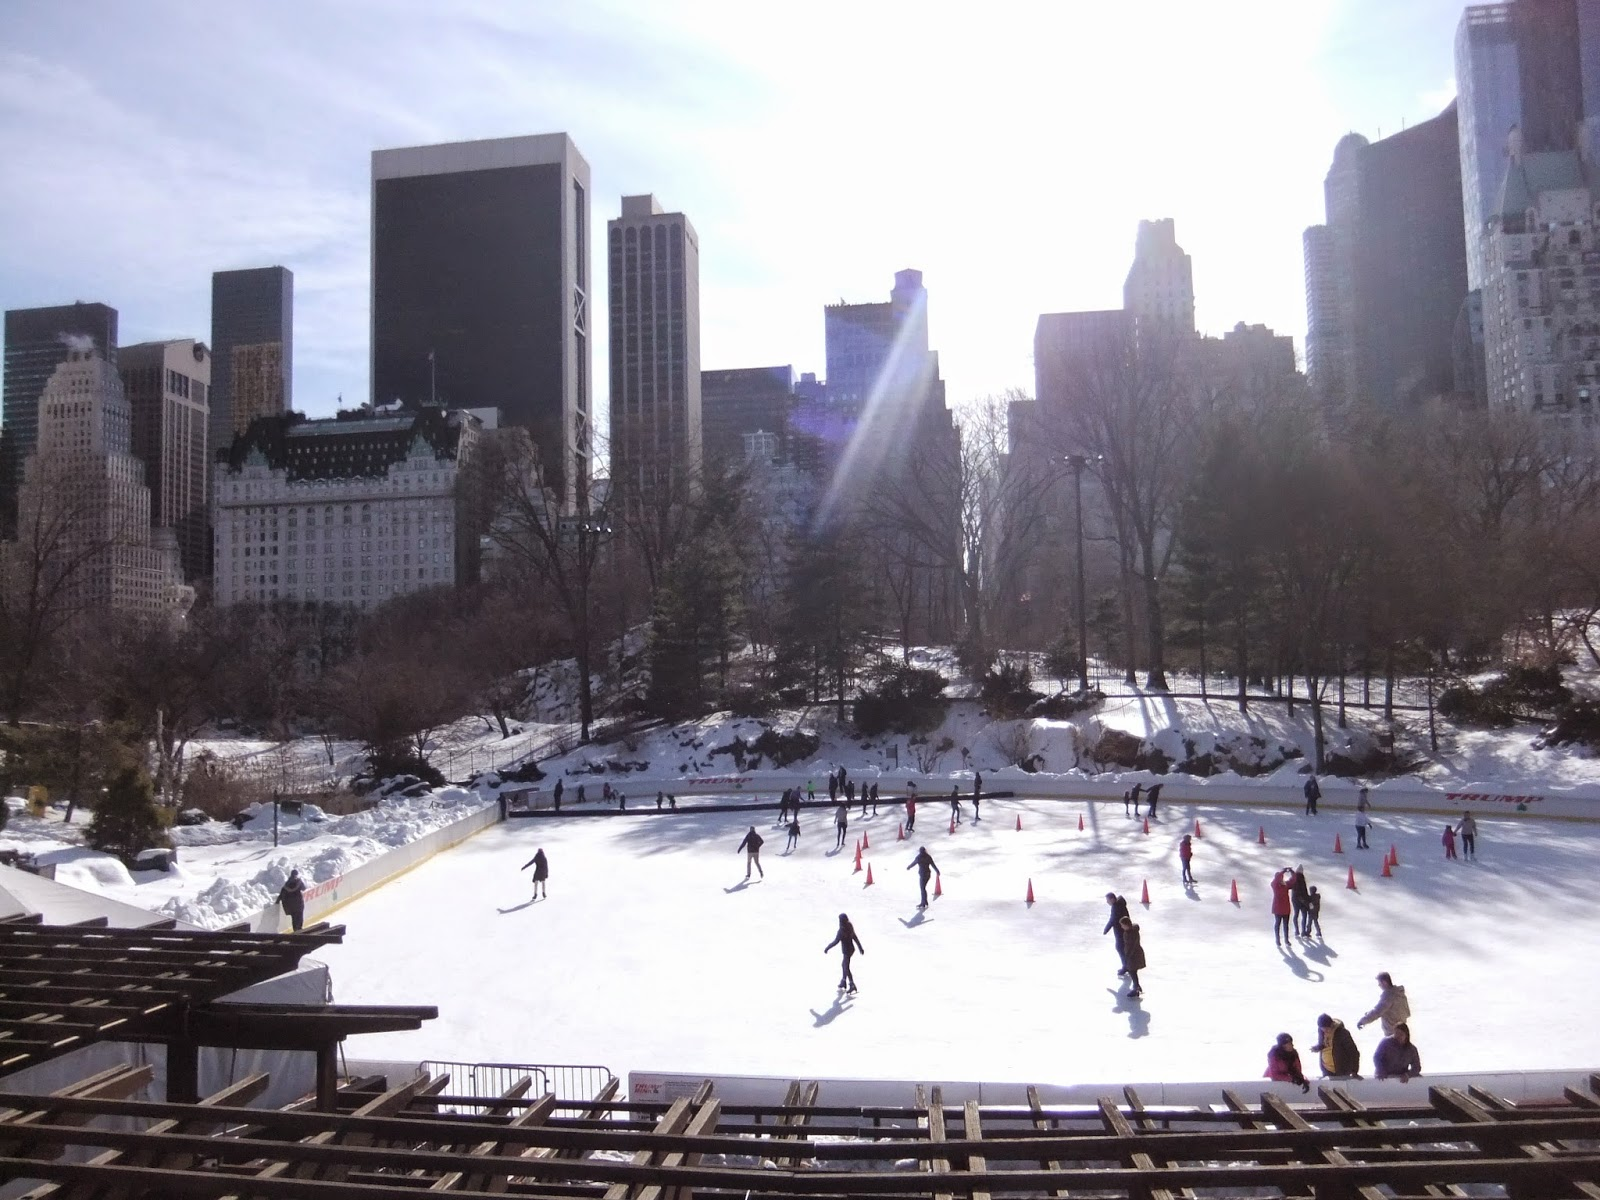 Central Park Ice Skating Rink